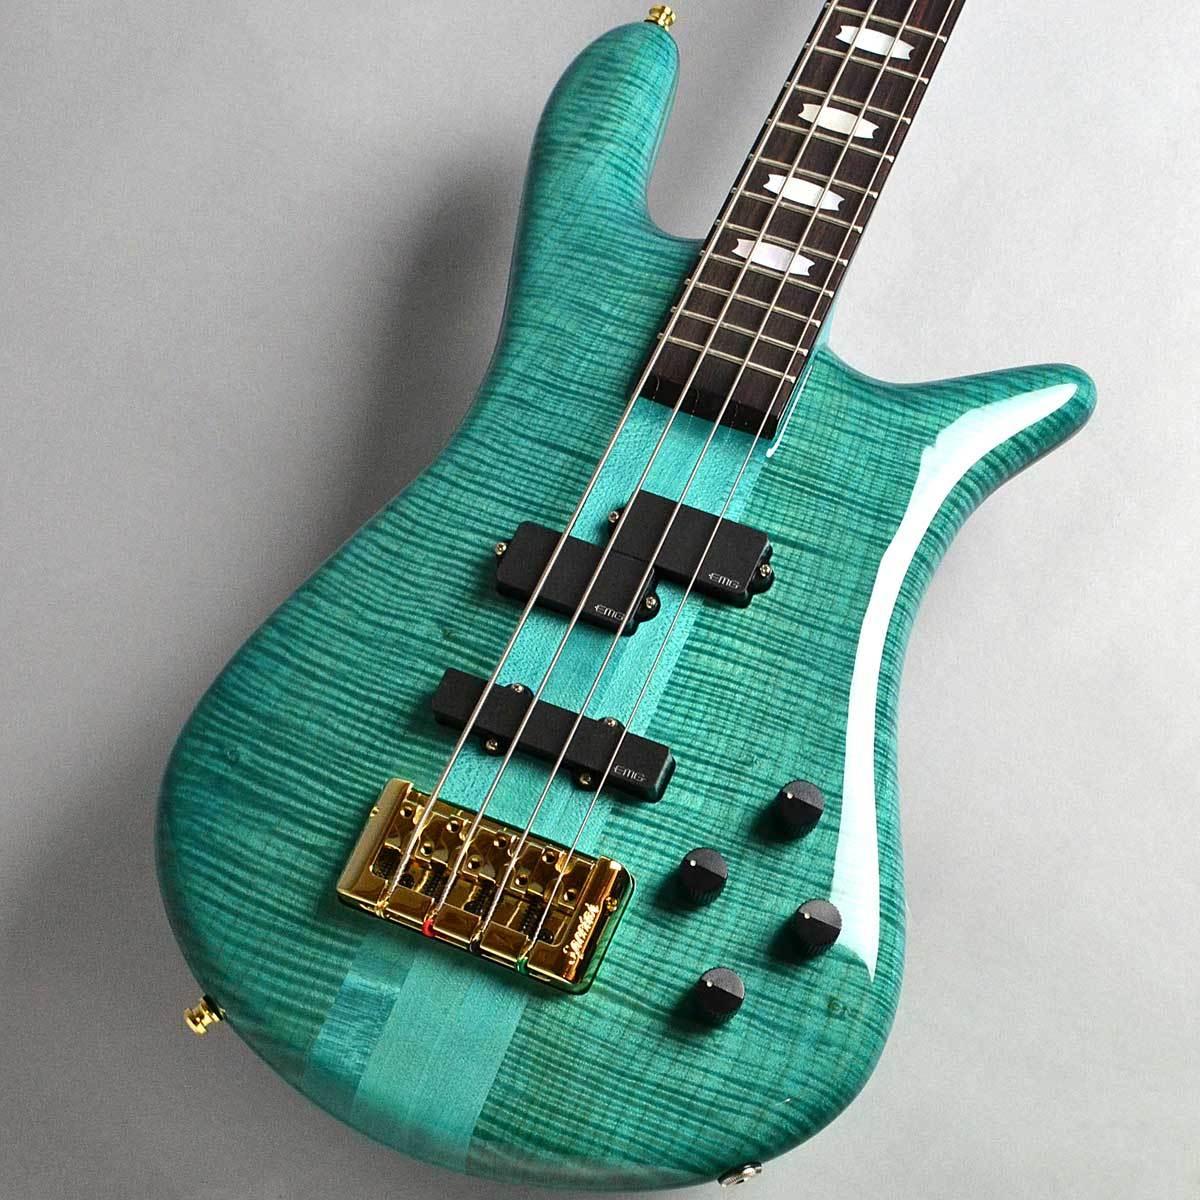 Spector EURO 4 LX Premium Wood/Peacock Blue Gloss エレキベース(4弦) 【スペクター】【新宿PePe店】【長期店頭展示品特別価格】